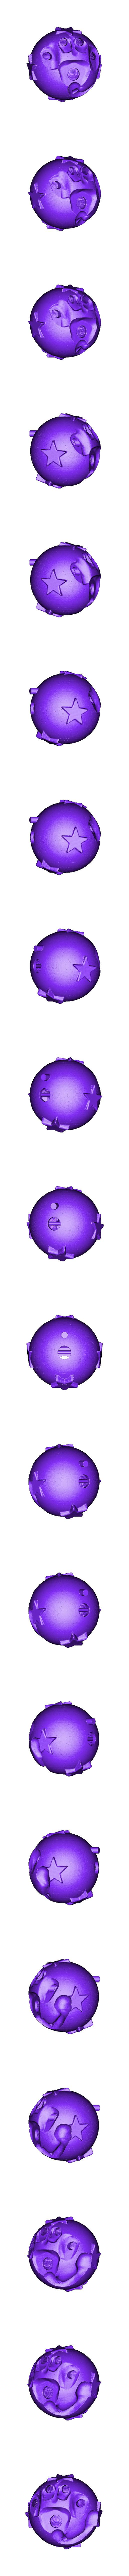 Lion_Ball_Lamp_Ball.stl Download free OBJ file Lion On Ball Nighlight/Lamp • 3D printable template, Pza4Rza